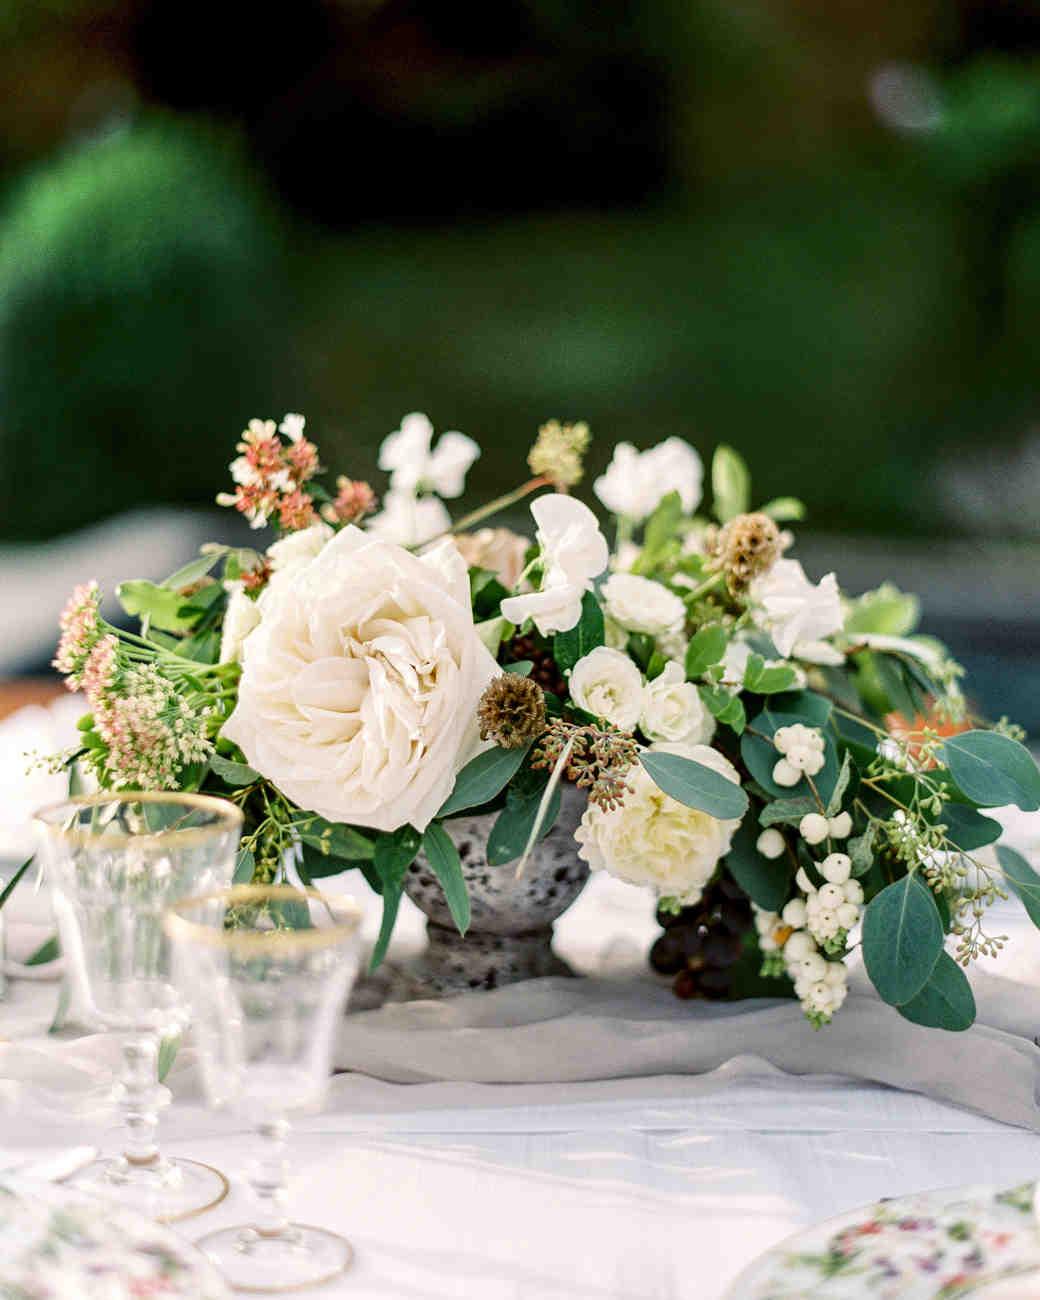 Uncategorized Wedding Flower Table Arrangements Ideas floral wedding centerpieces martha stewart weddings short and sweet flower arrangements